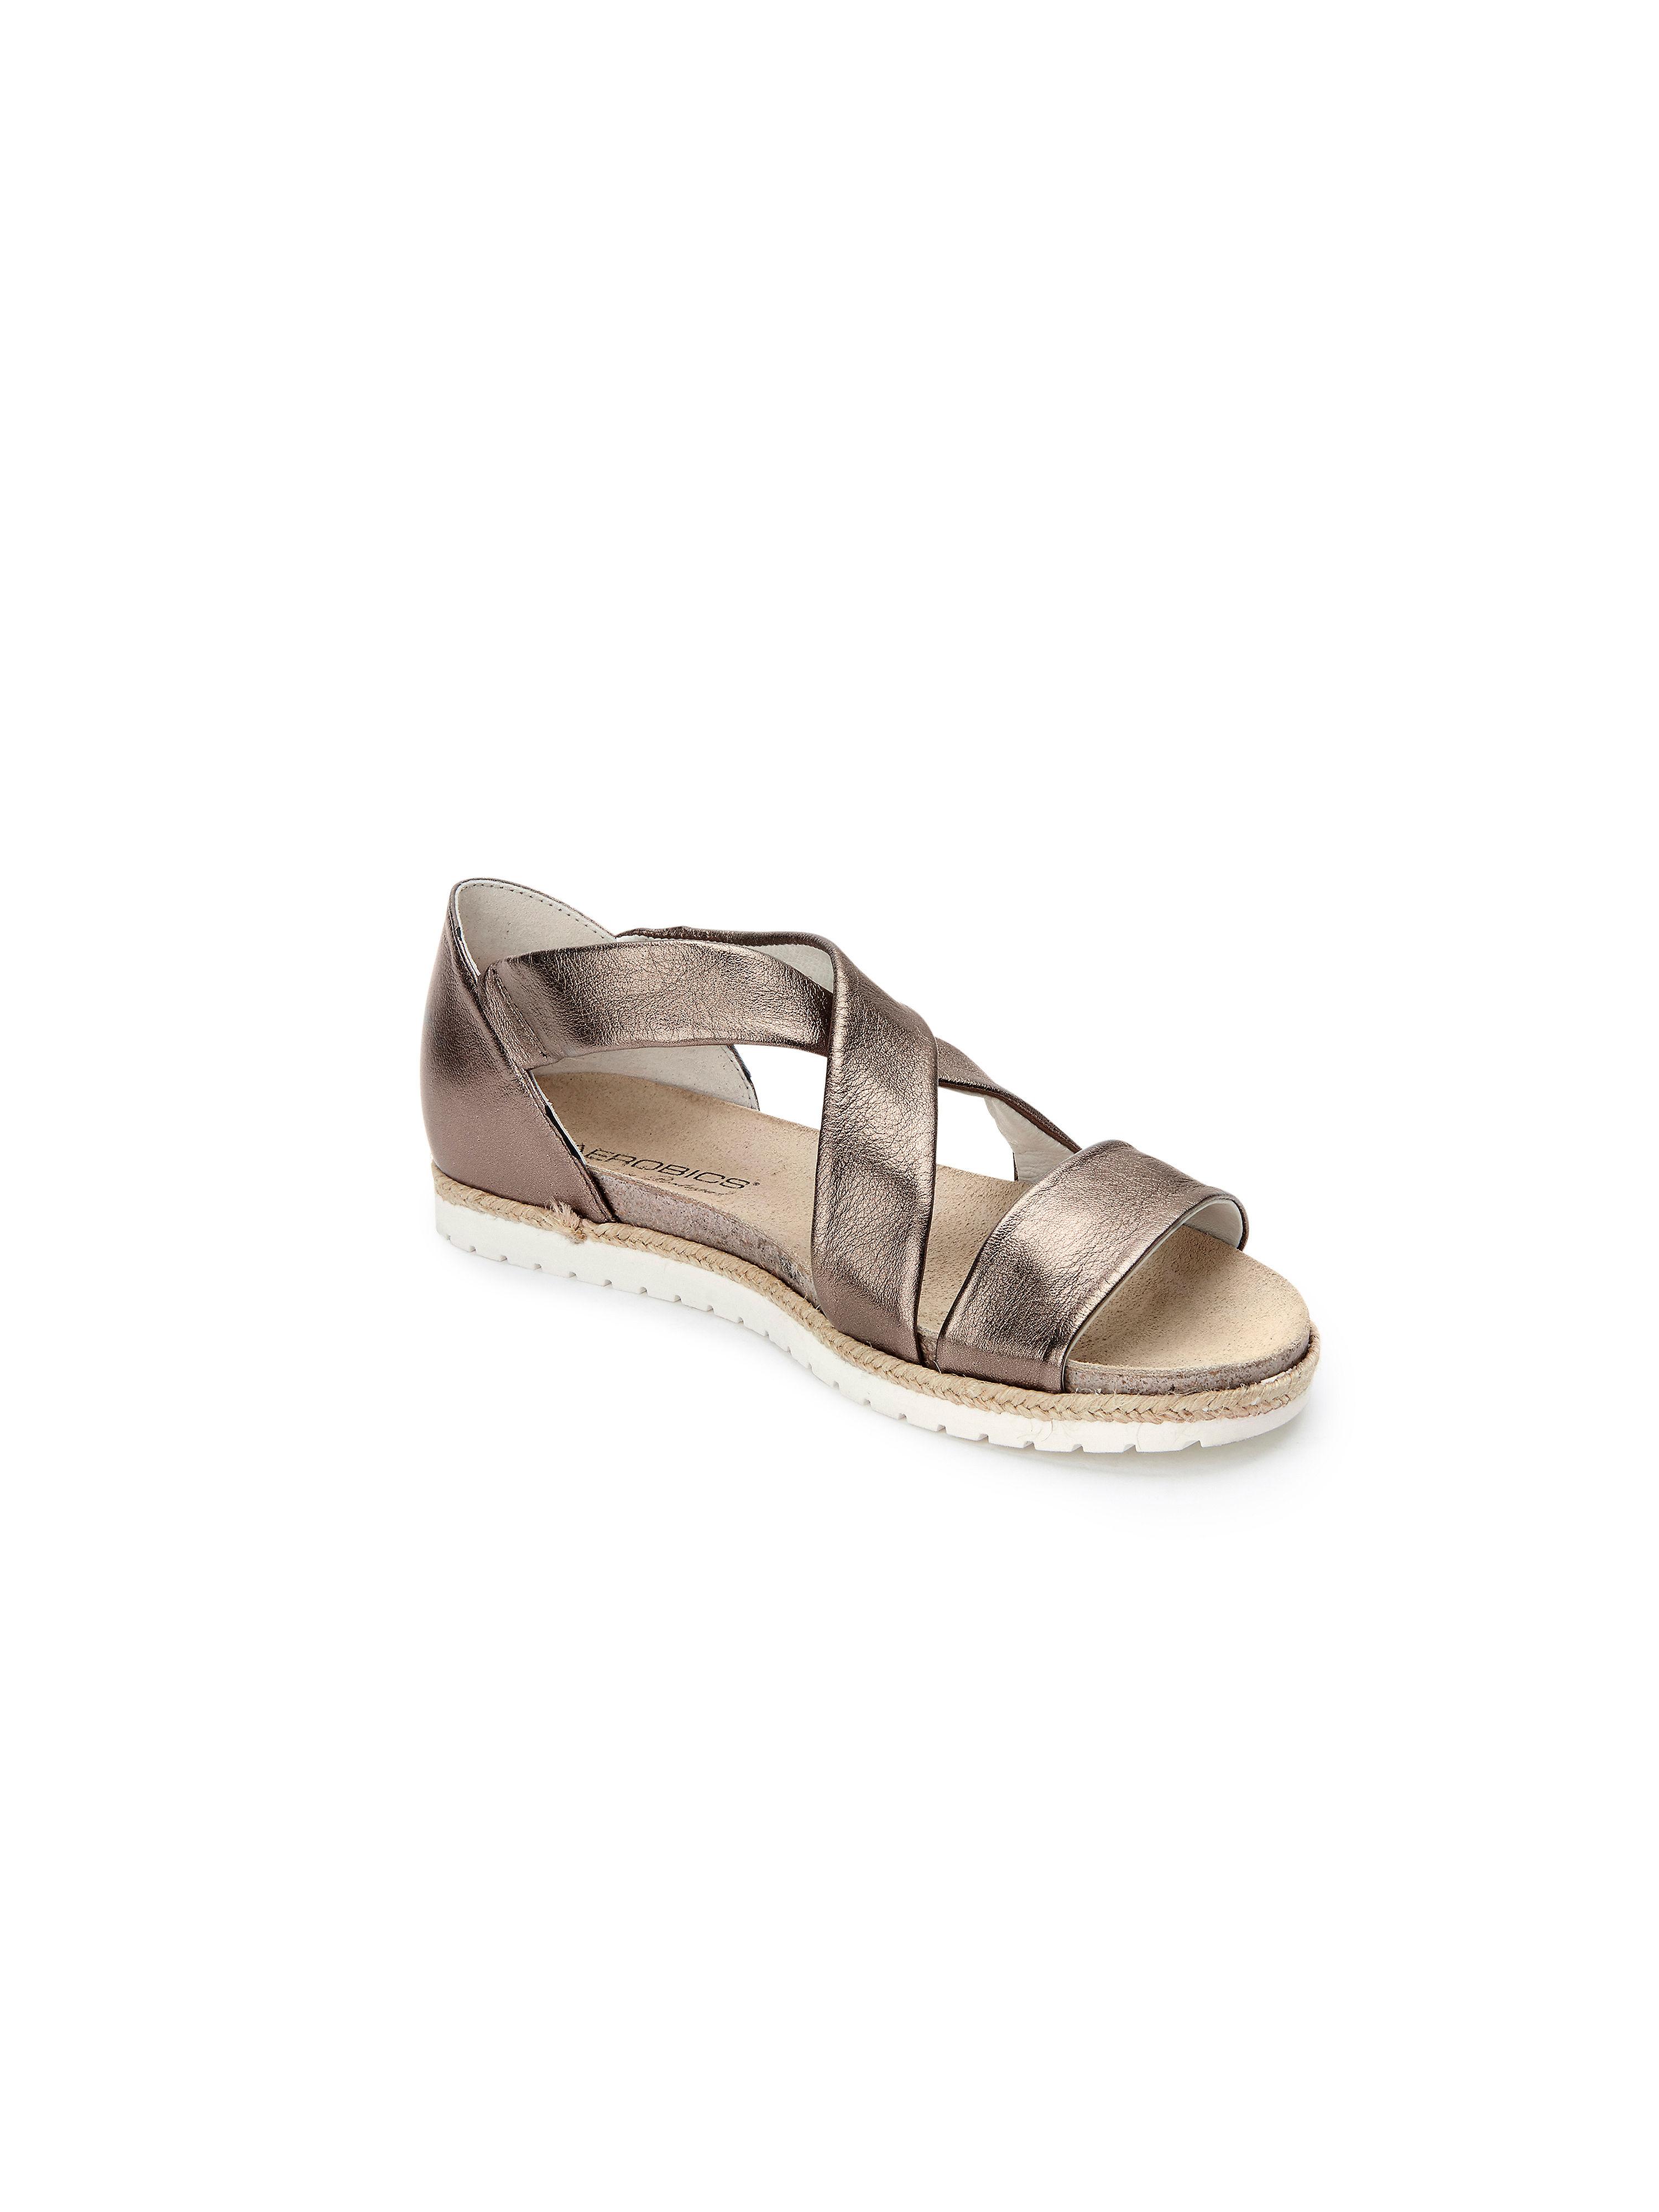 Aerobics - Sandale aus 100% Leder - Bronze-Metallic Gute Qualität beliebte Schuhe